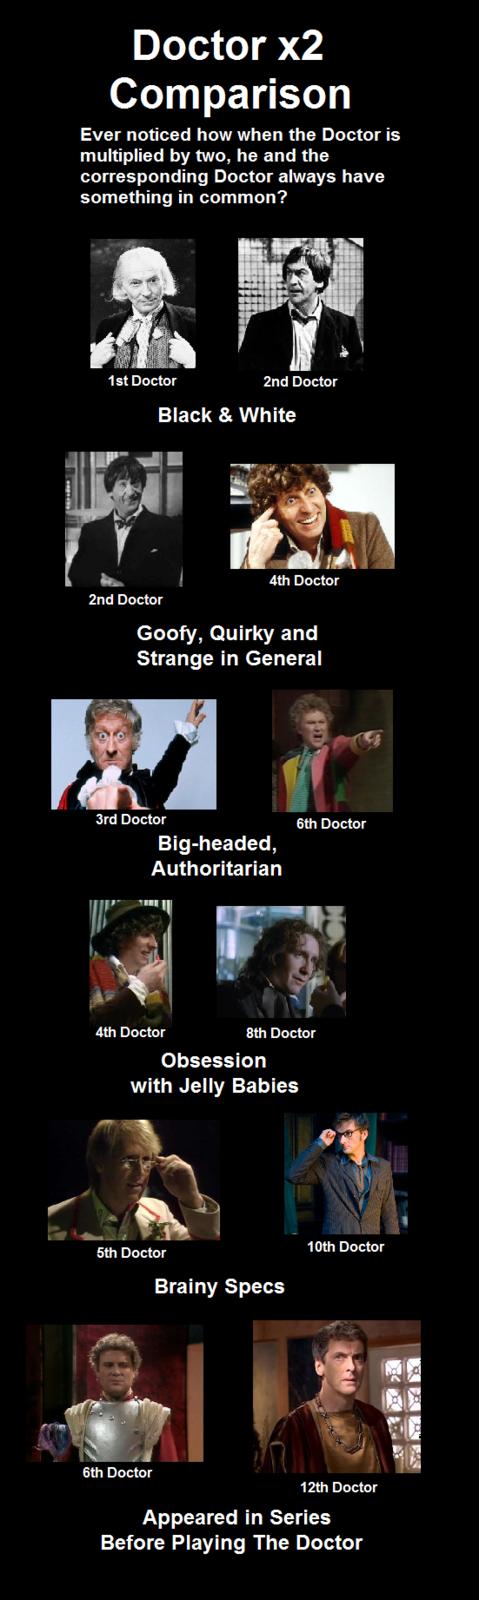 Doctor x2 Comparison